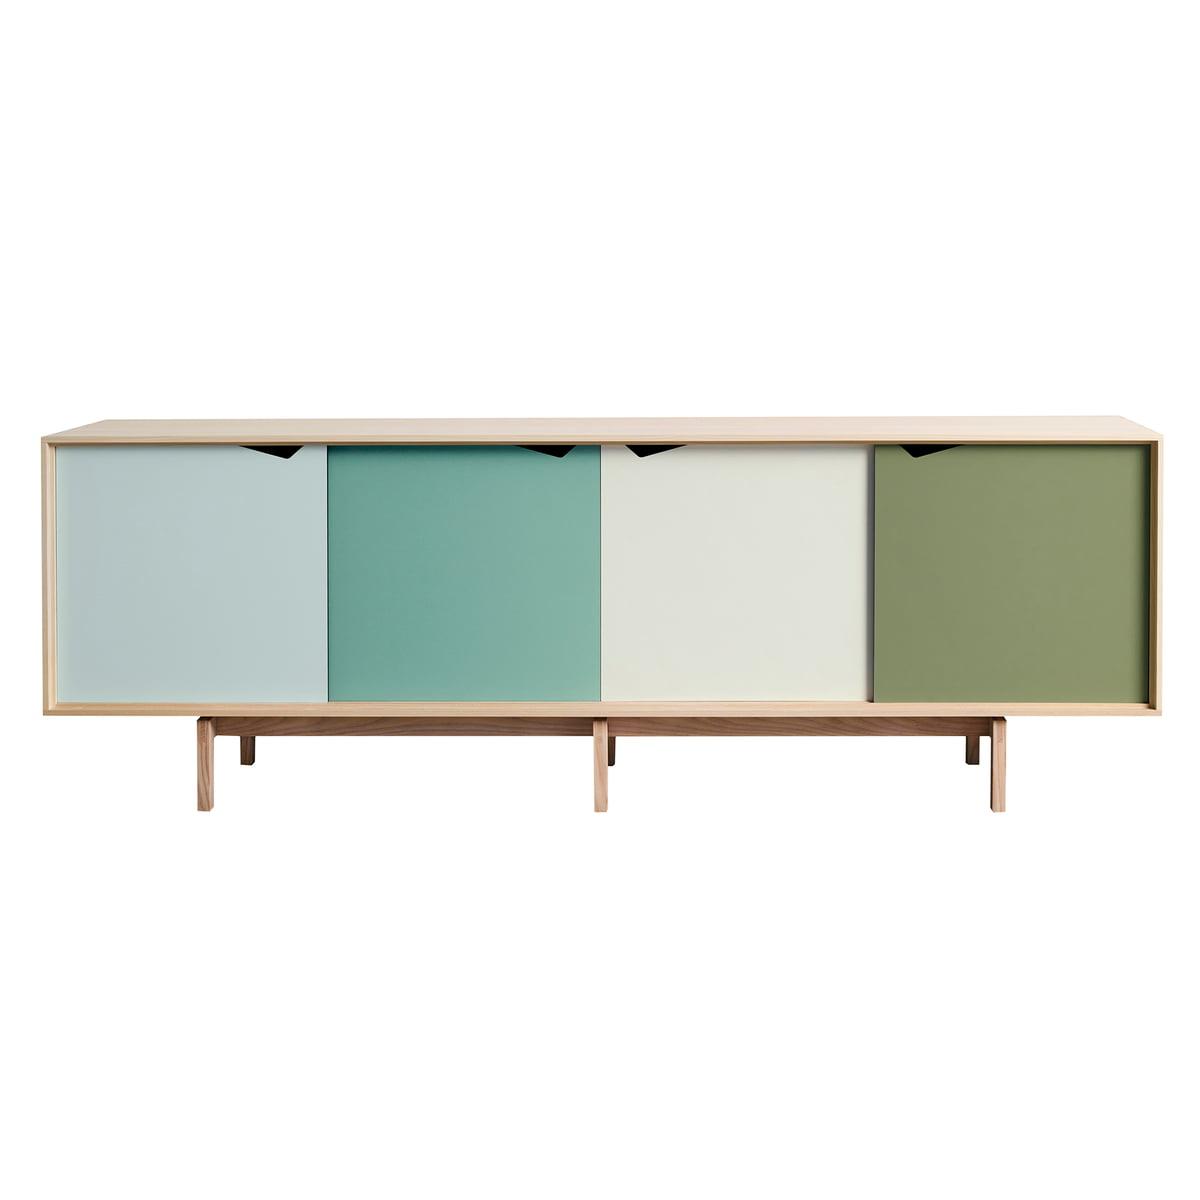 Andersen Furniture S1 Sideboard Eiche Geseift Türen Dali